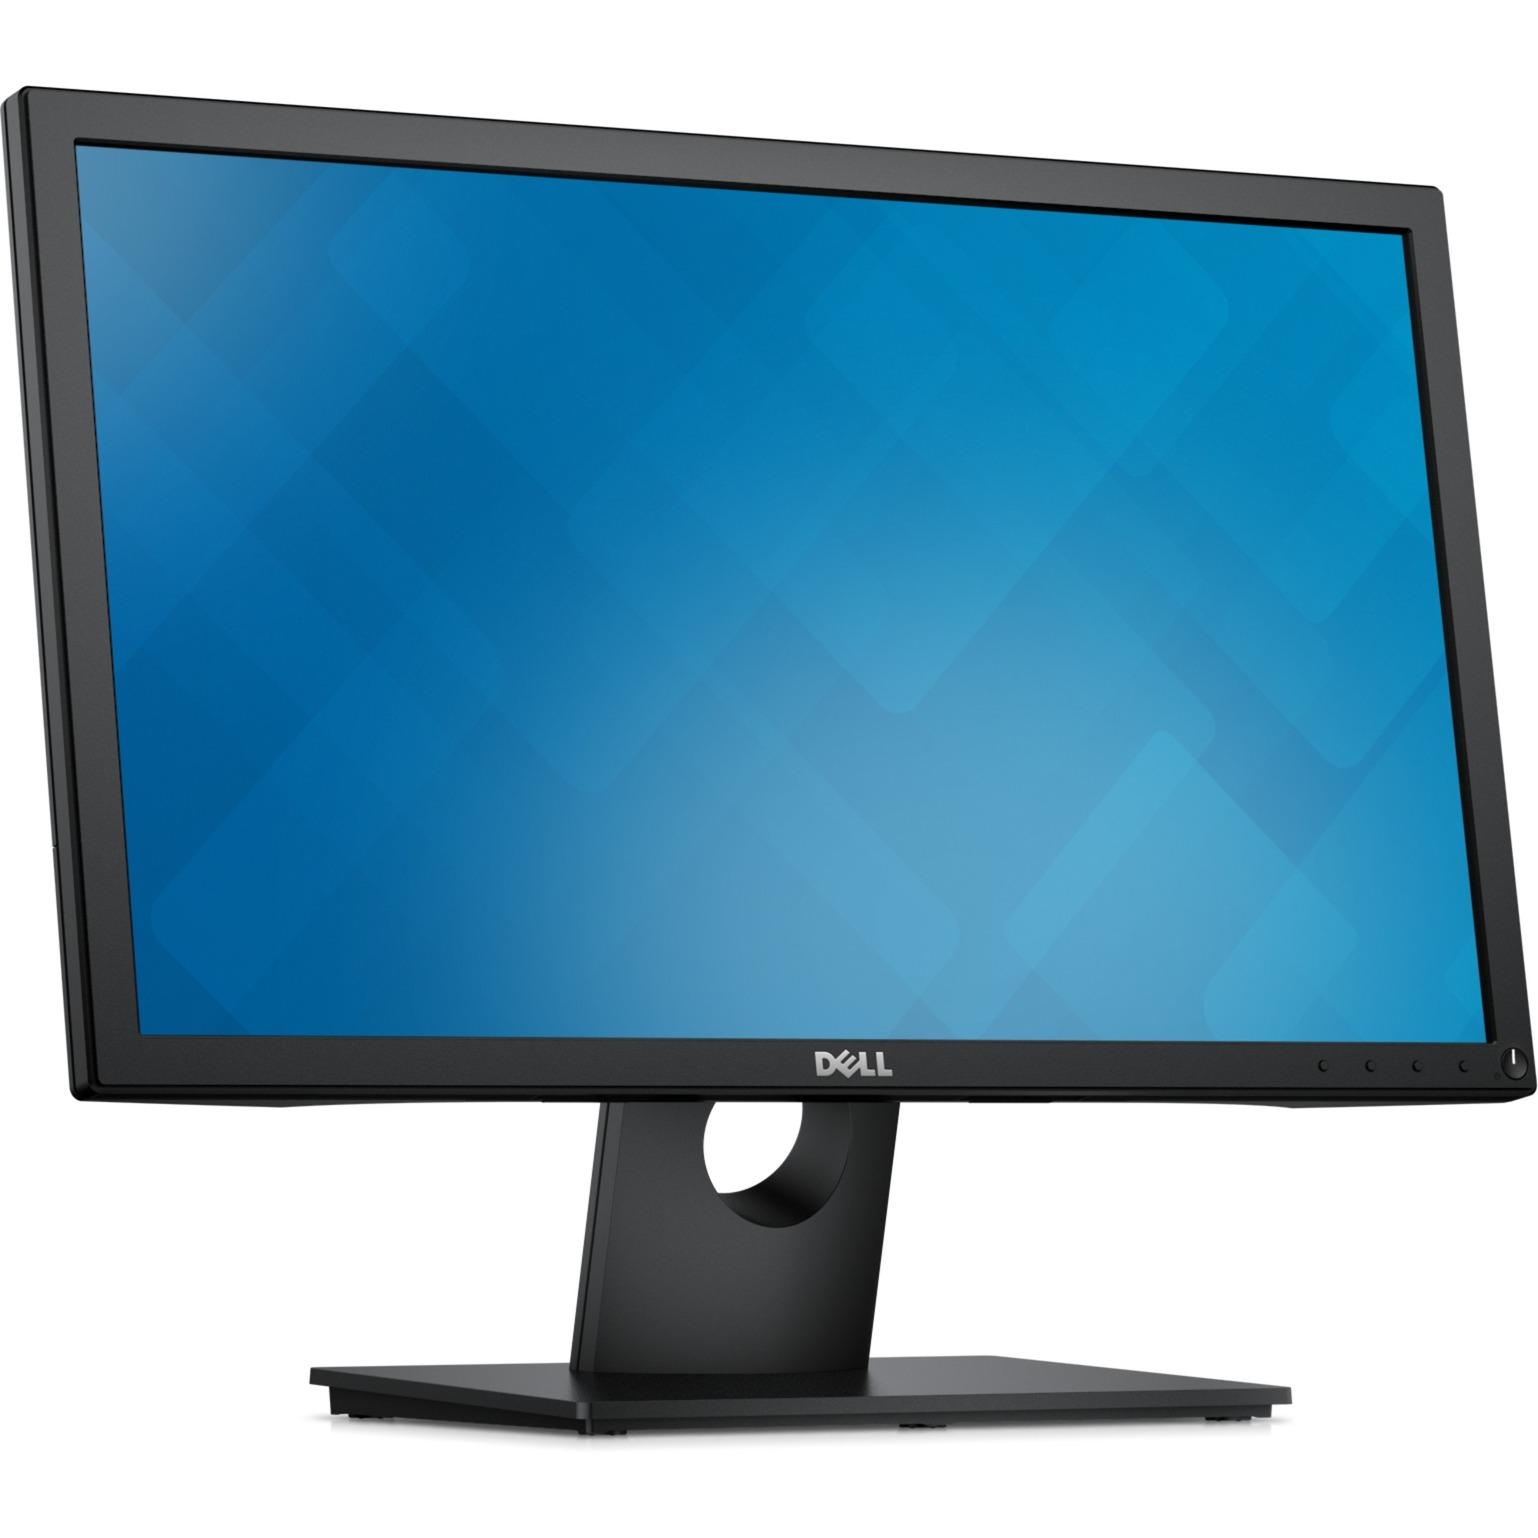 "E Series E2216H 21.5"" Full HD LED Mate Plana Negro pantalla para PC, Monitor LED"